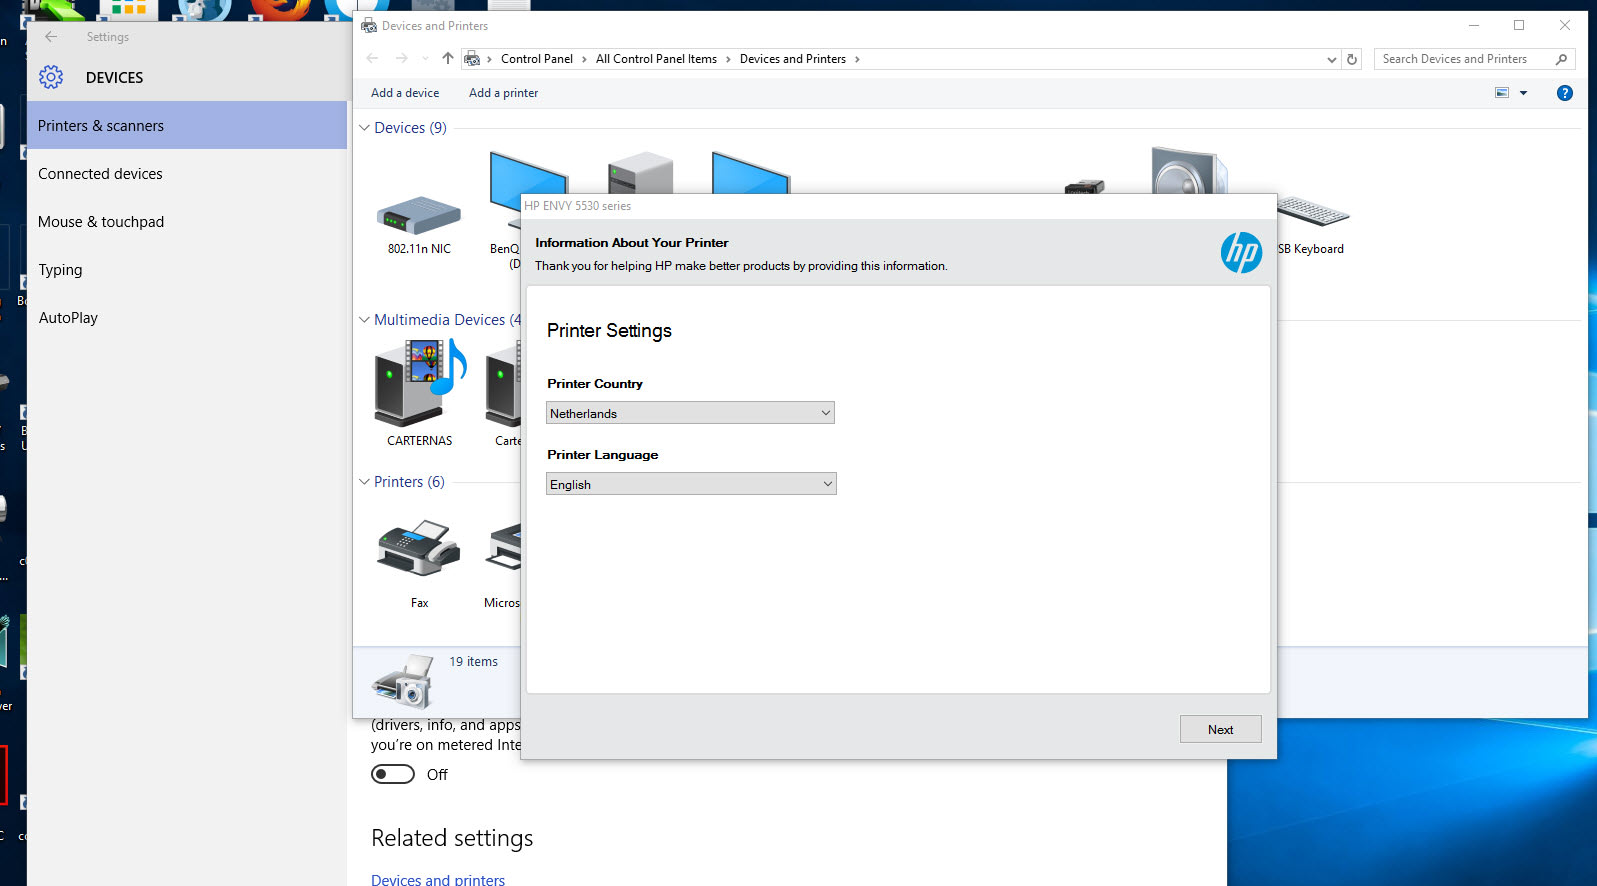 HP Pavilion g6 1a52nr Notebook PC Driver